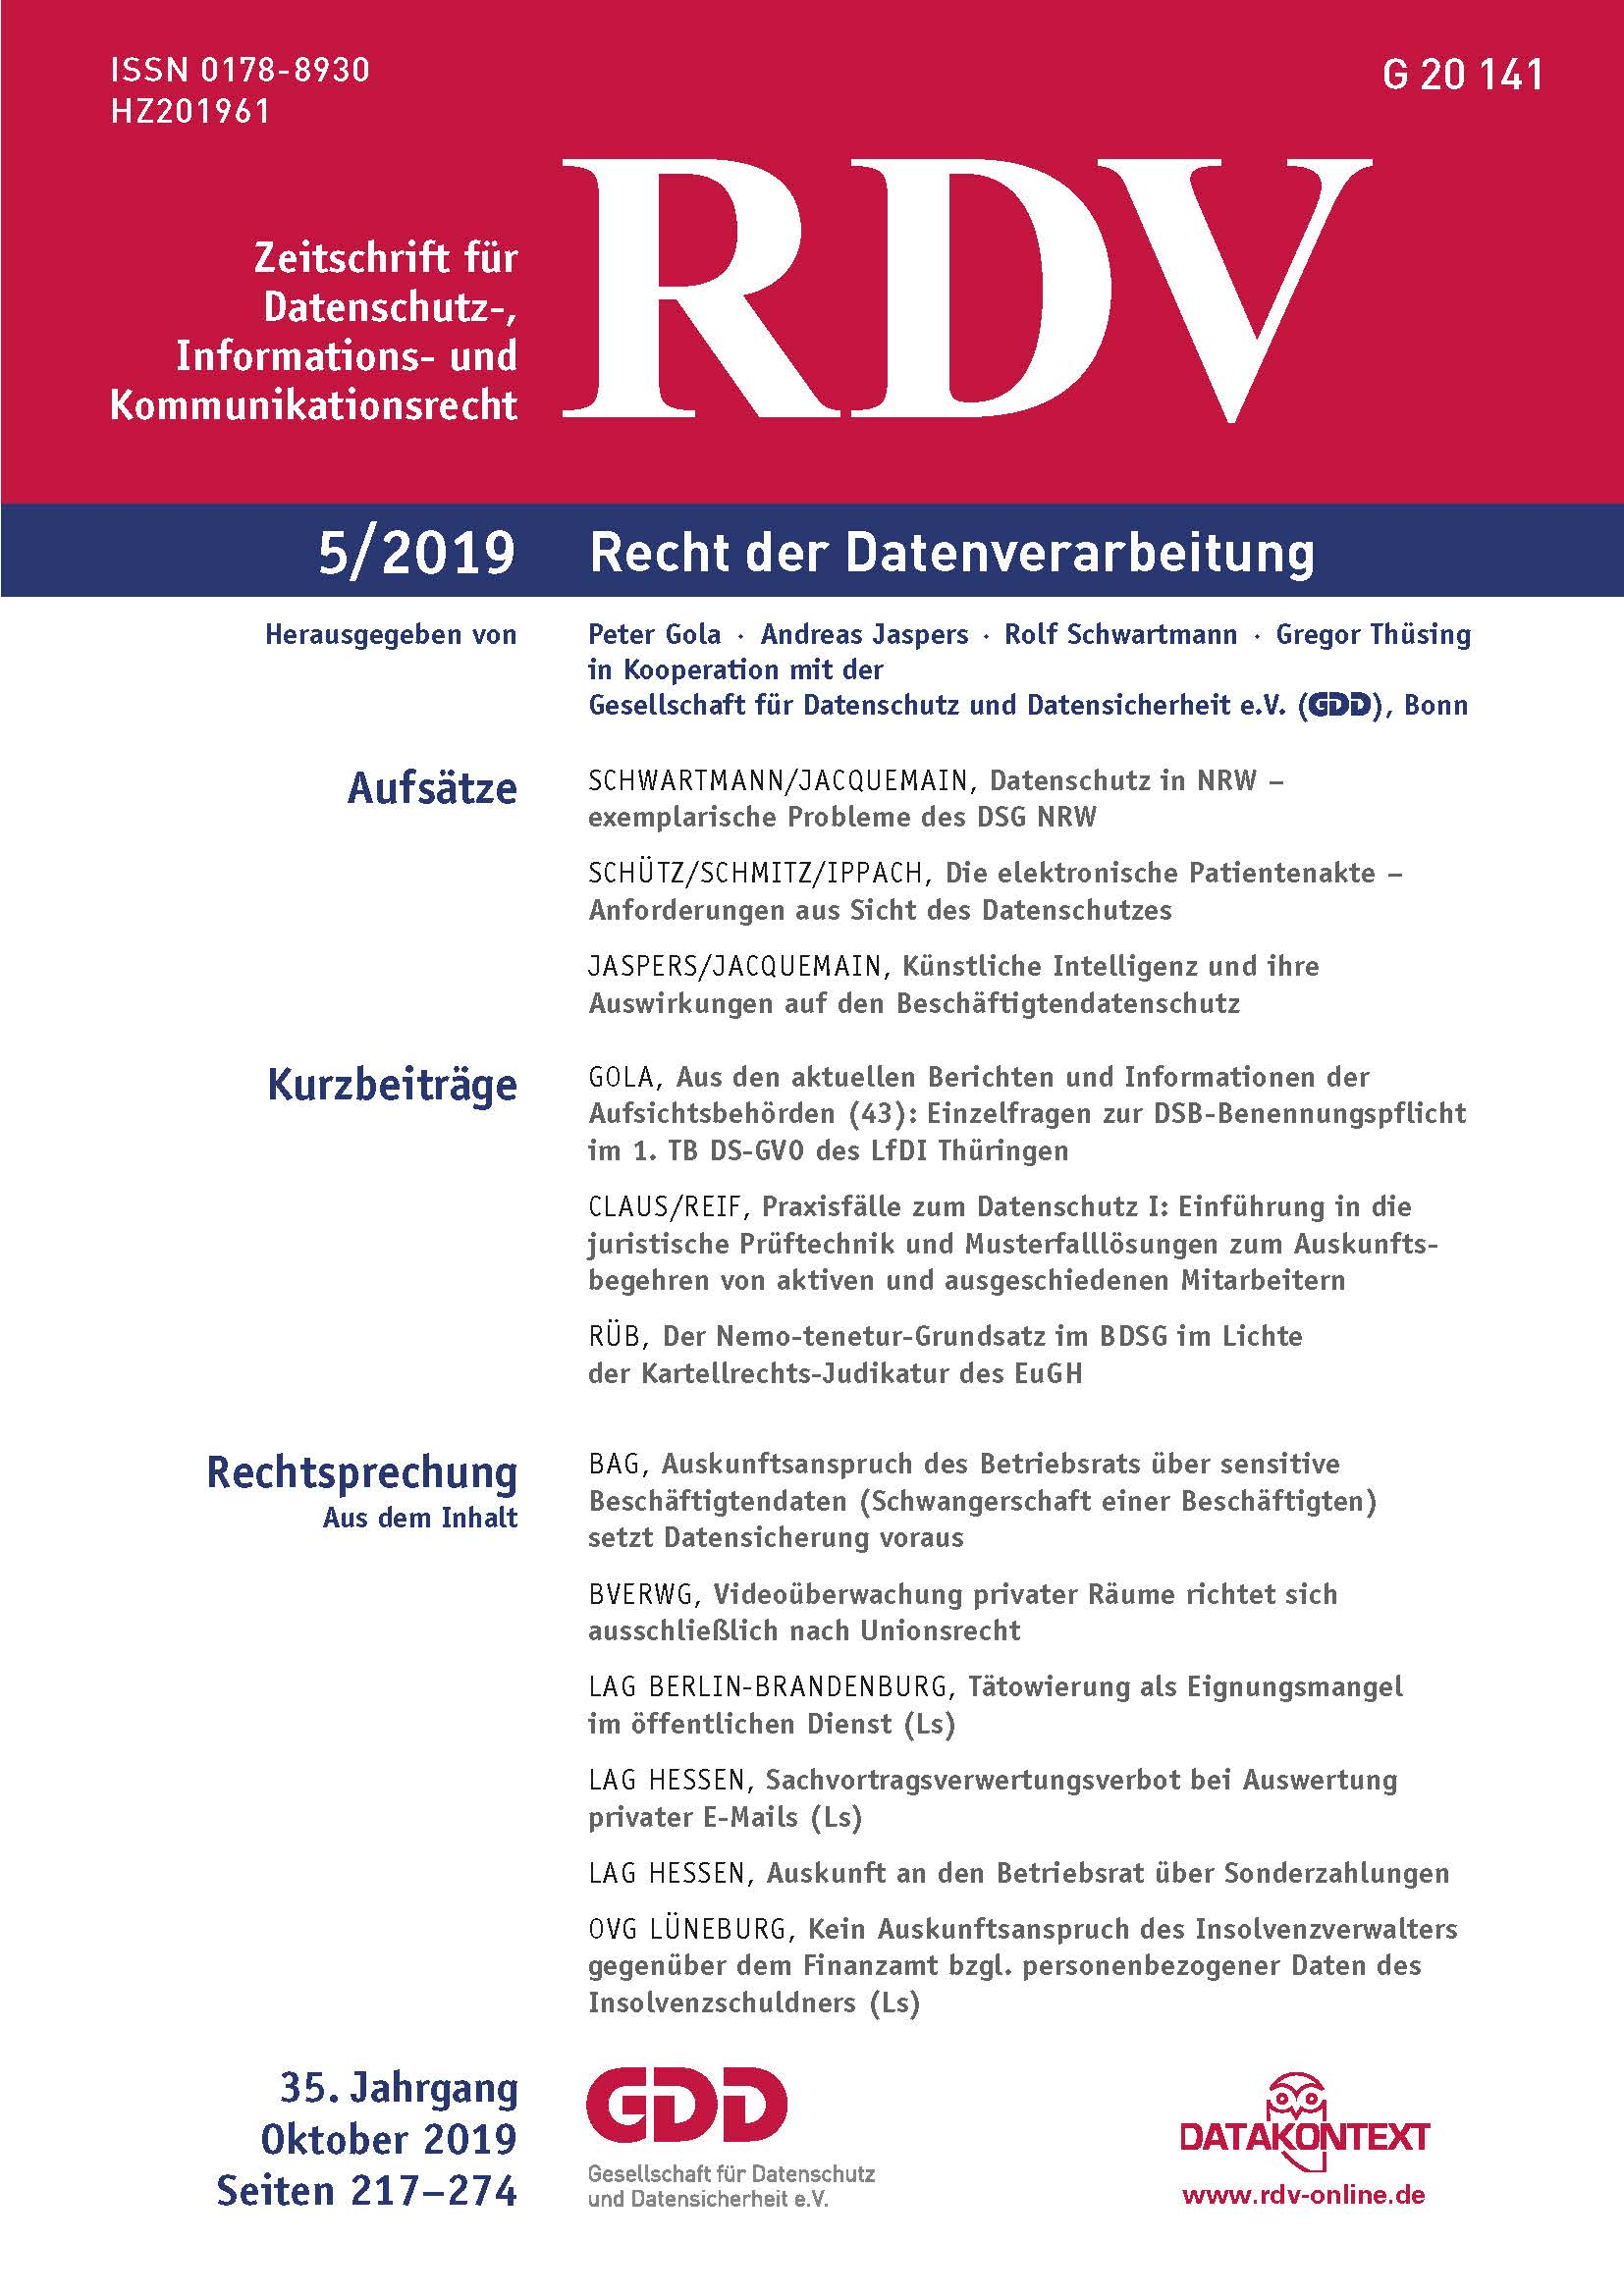 RDV_5_2019_Cover